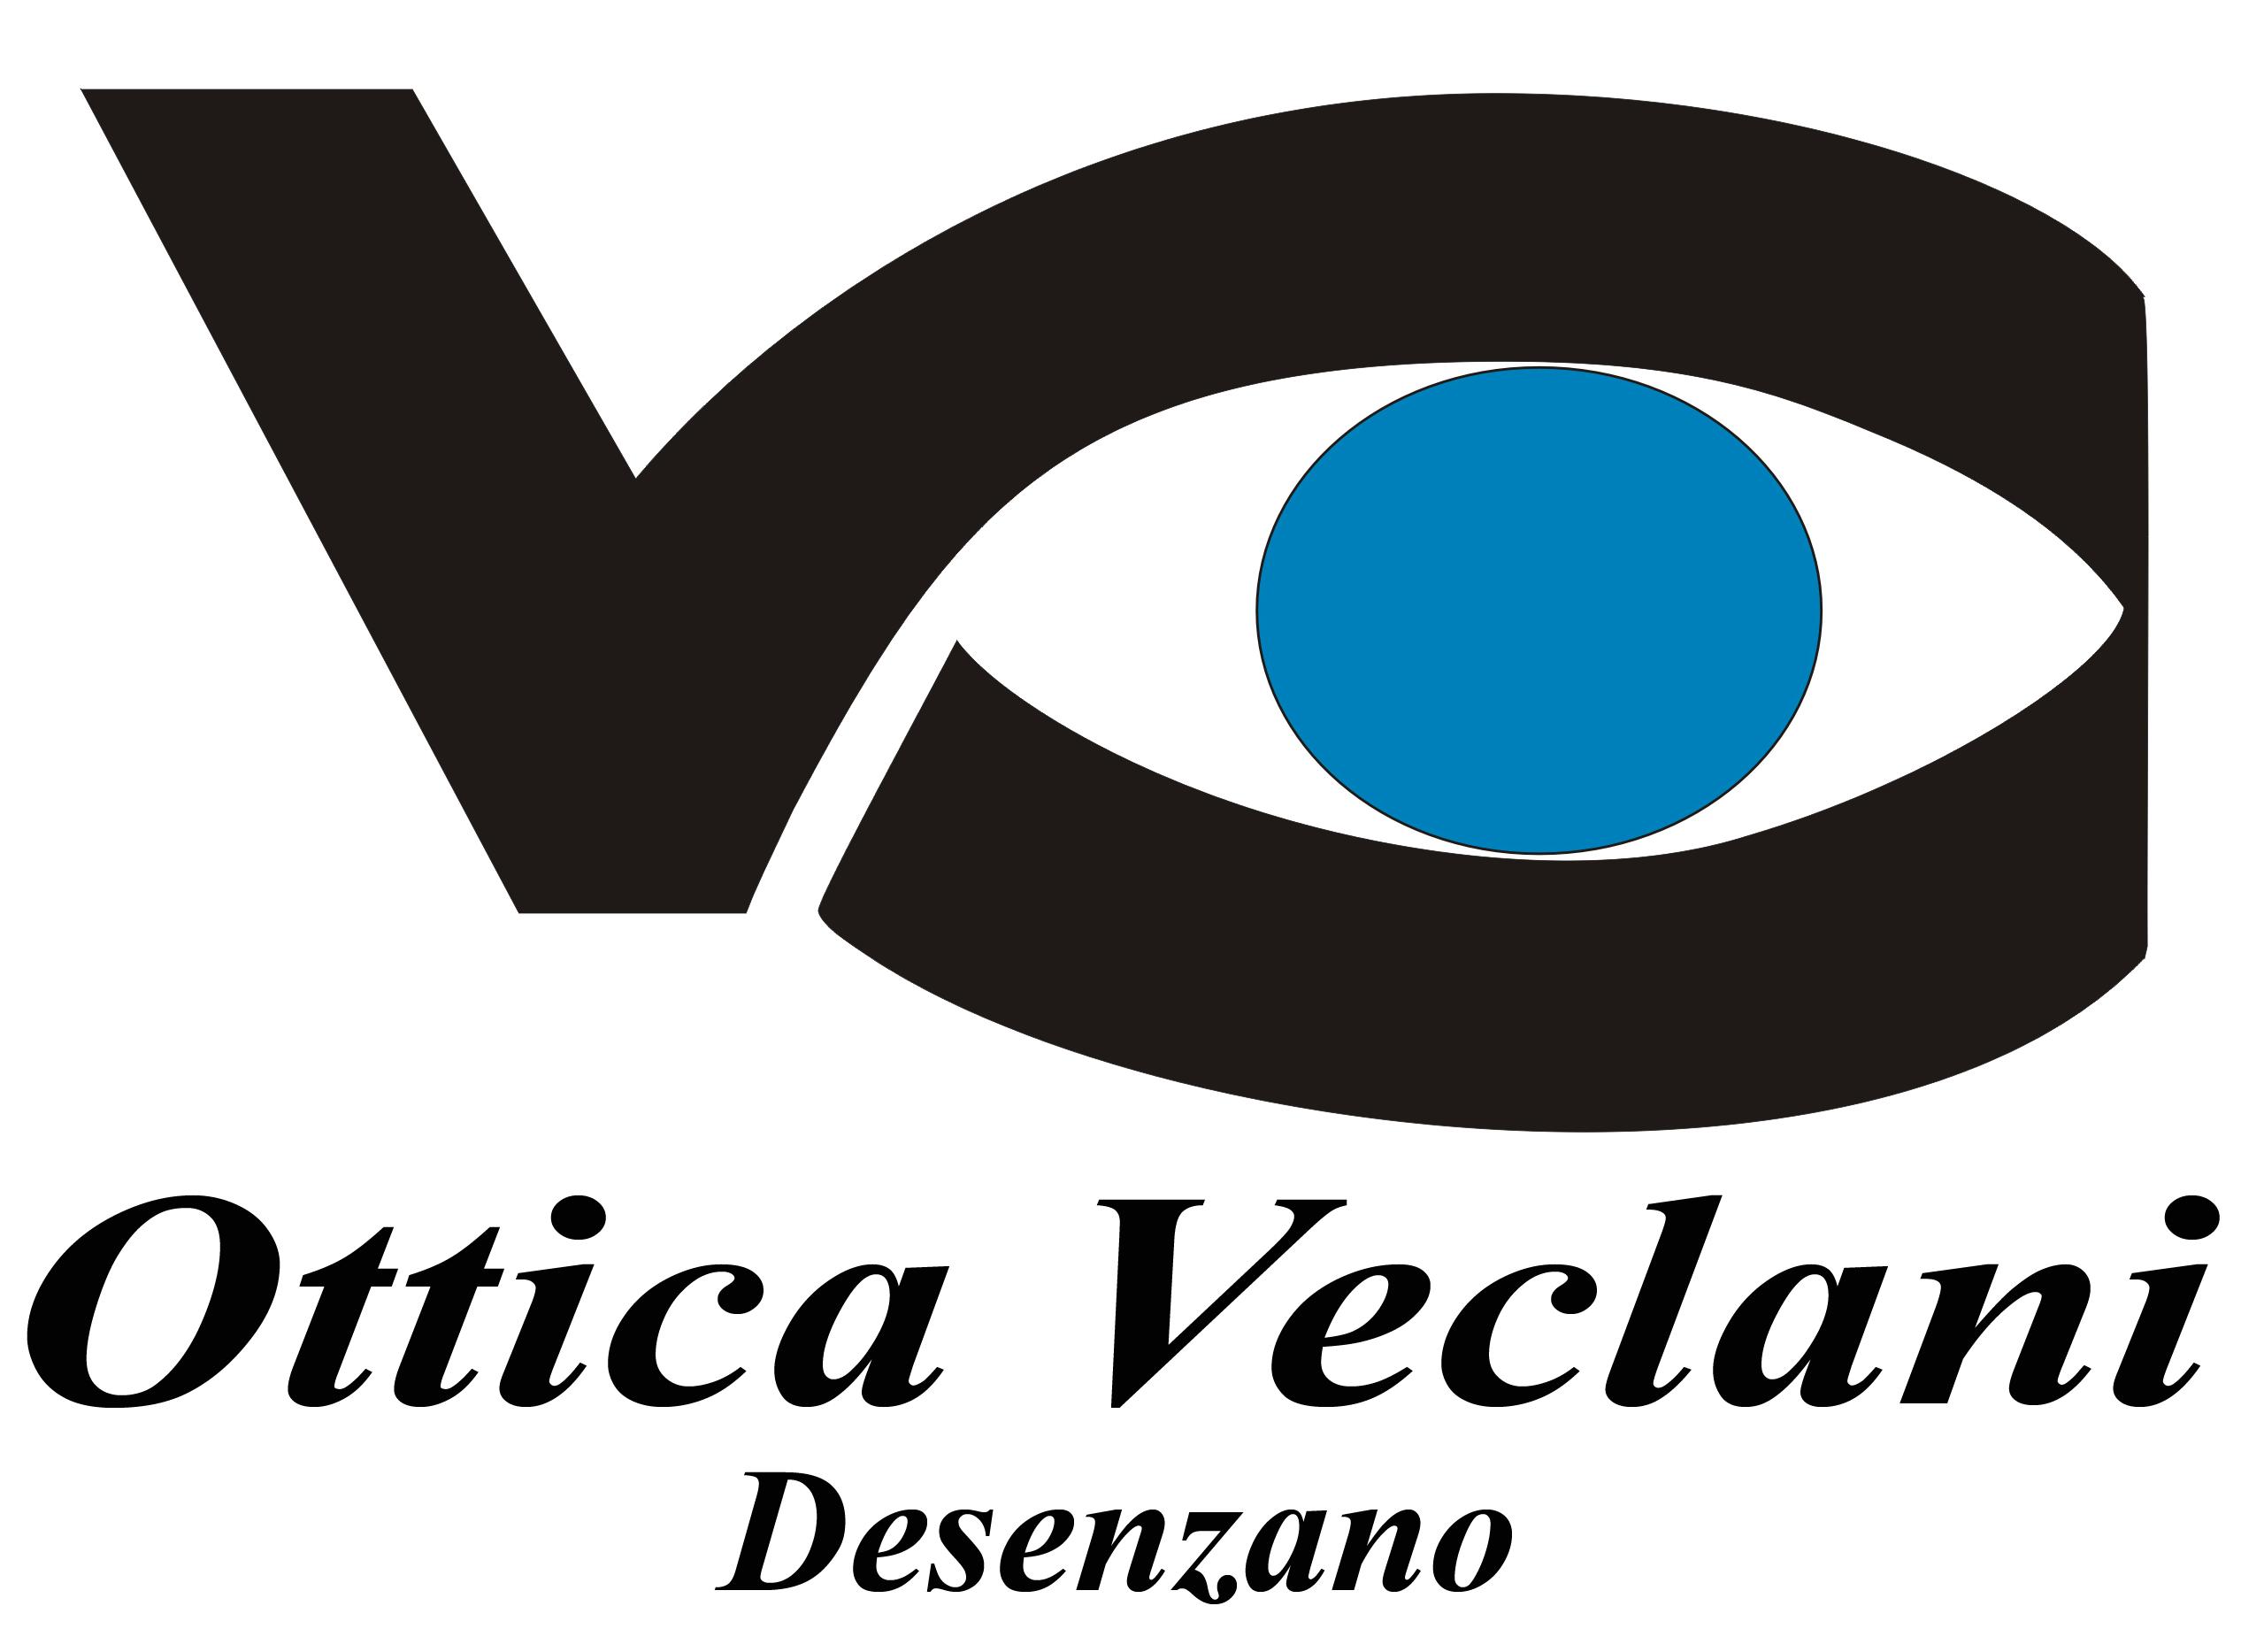 Logo-Veclani-Desenzano-3